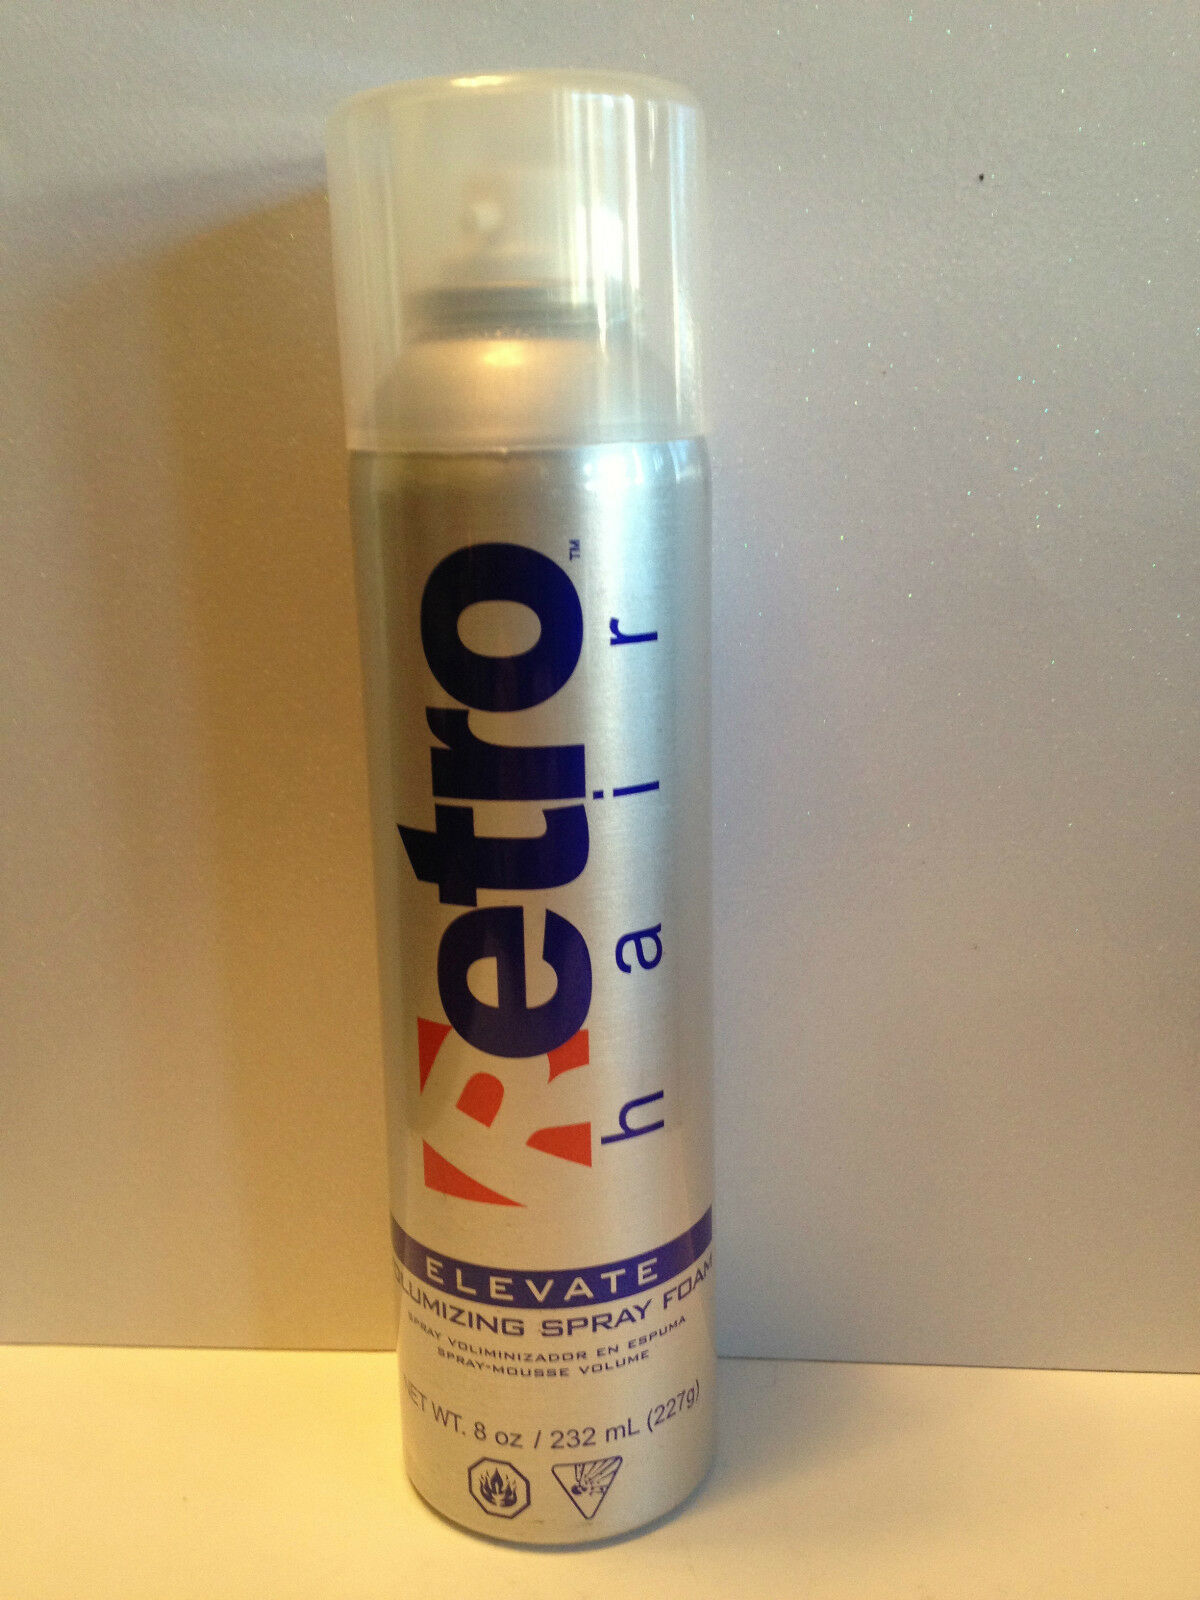 Retro Hair Elevate Aerosol Volumizing Root Lifting Spray Foam 8oz